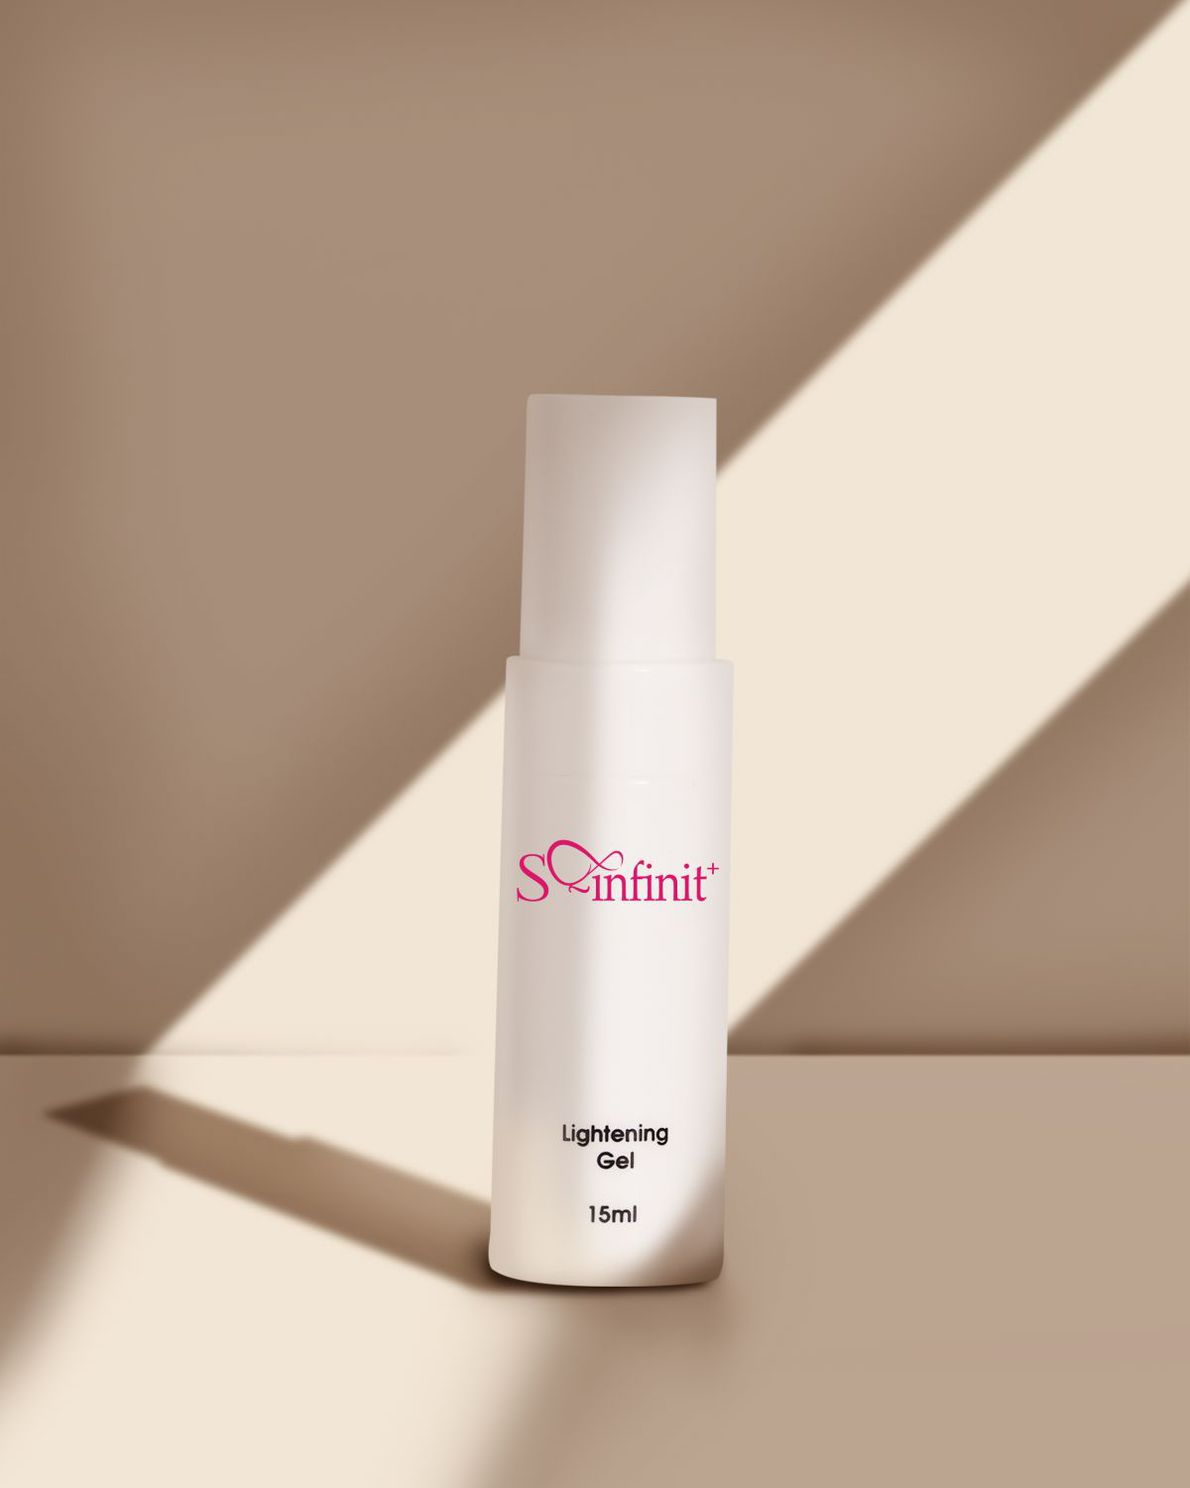 SQ-Infinit⁺ Intimate Lightening